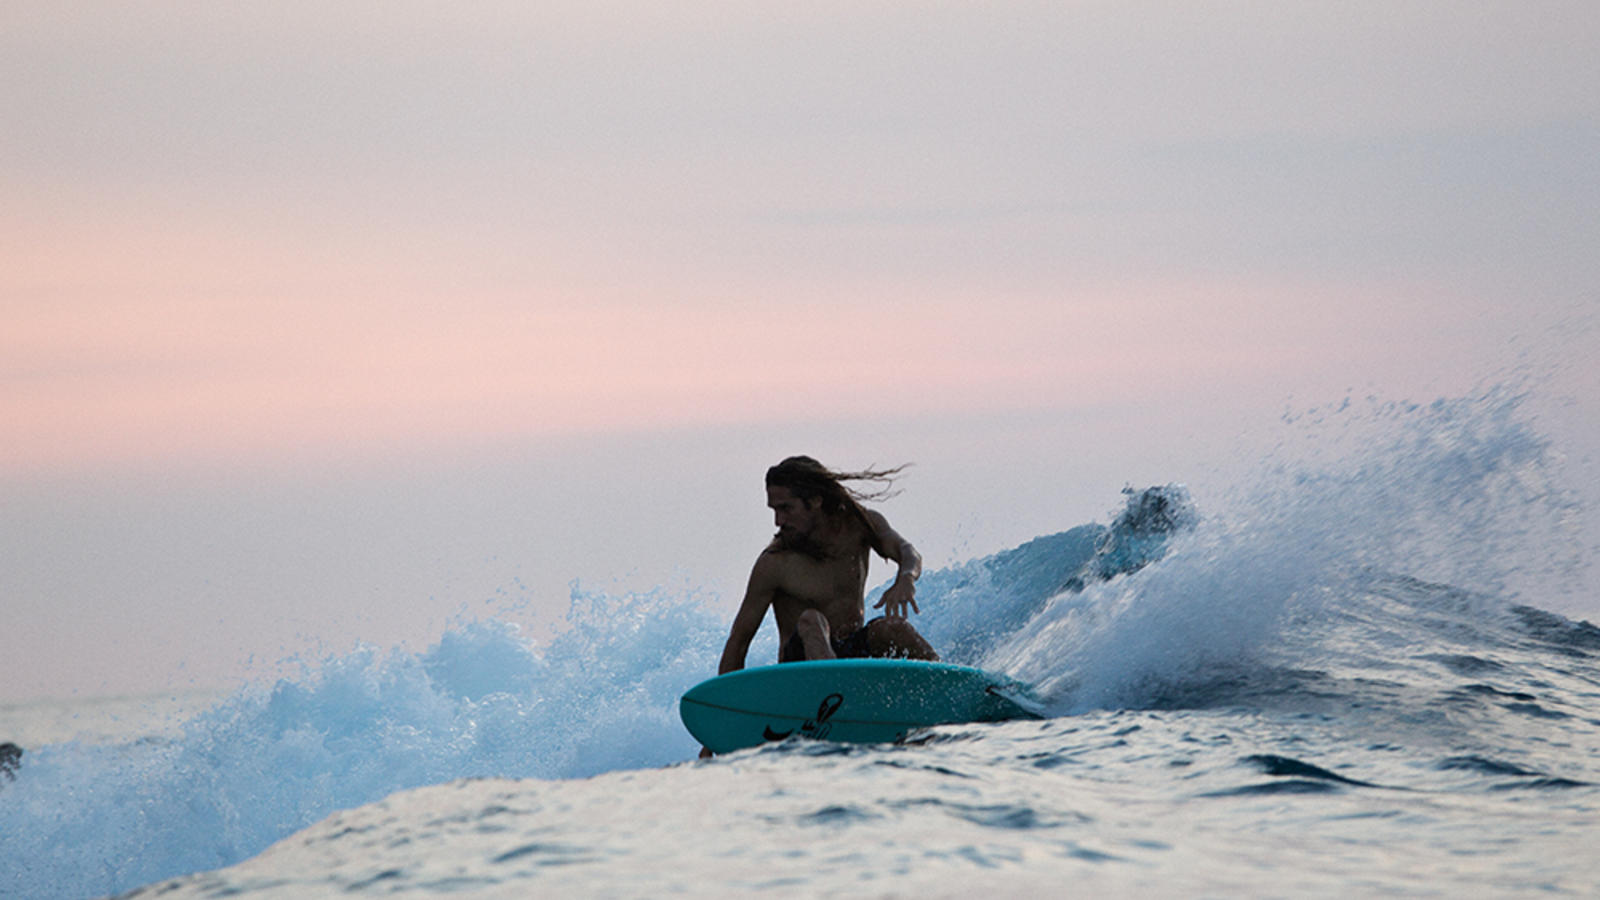 Hurley-Rob-Surfing